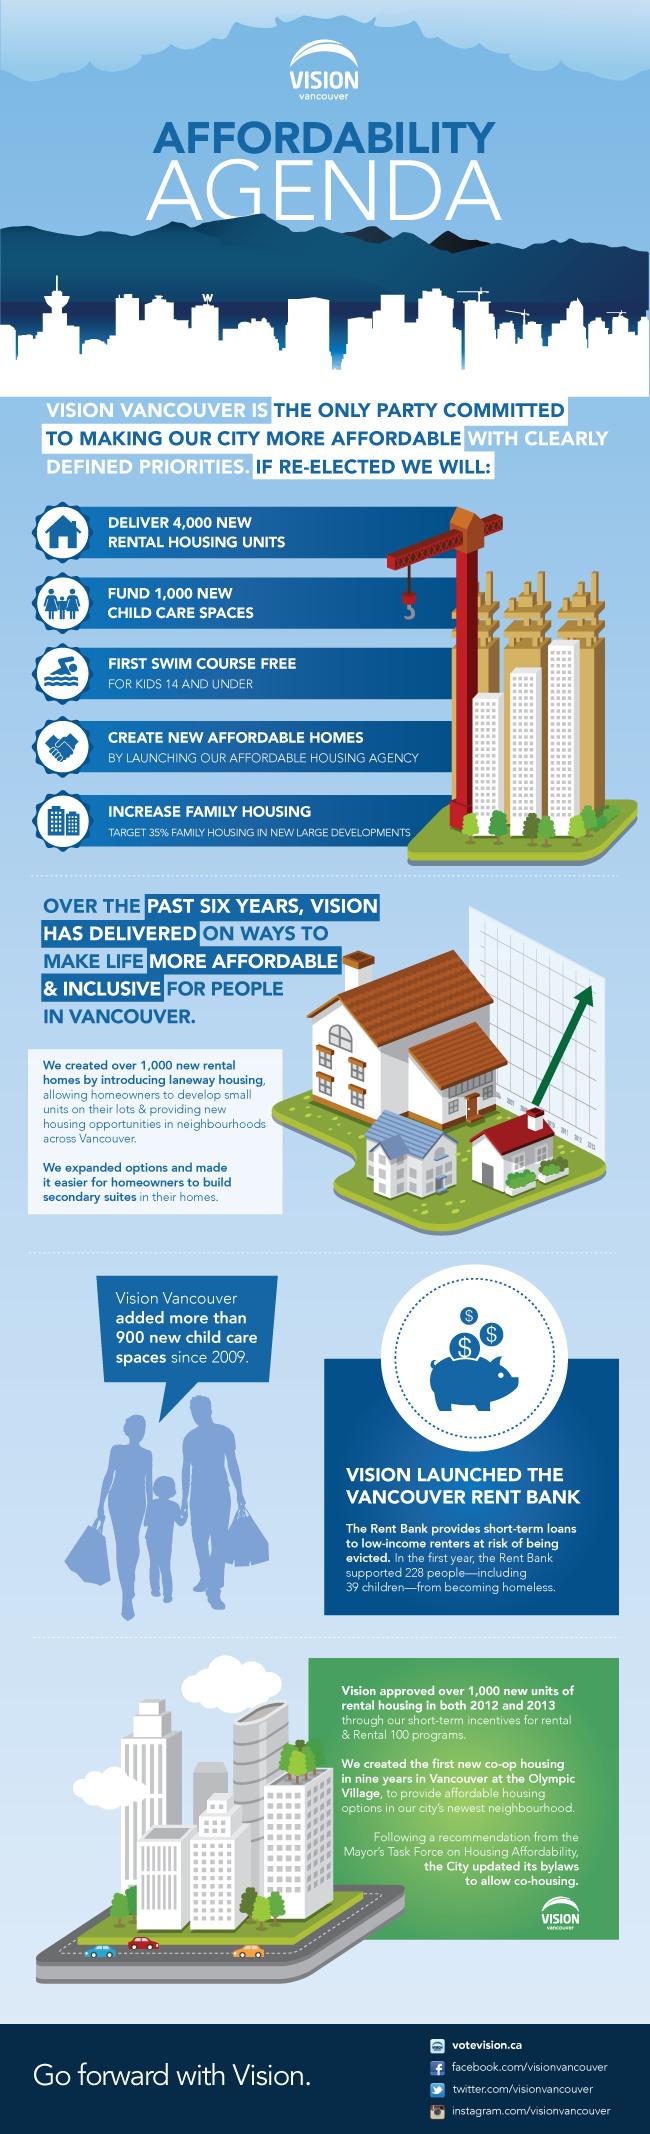 Affordability-Agenda-Web-Size.png